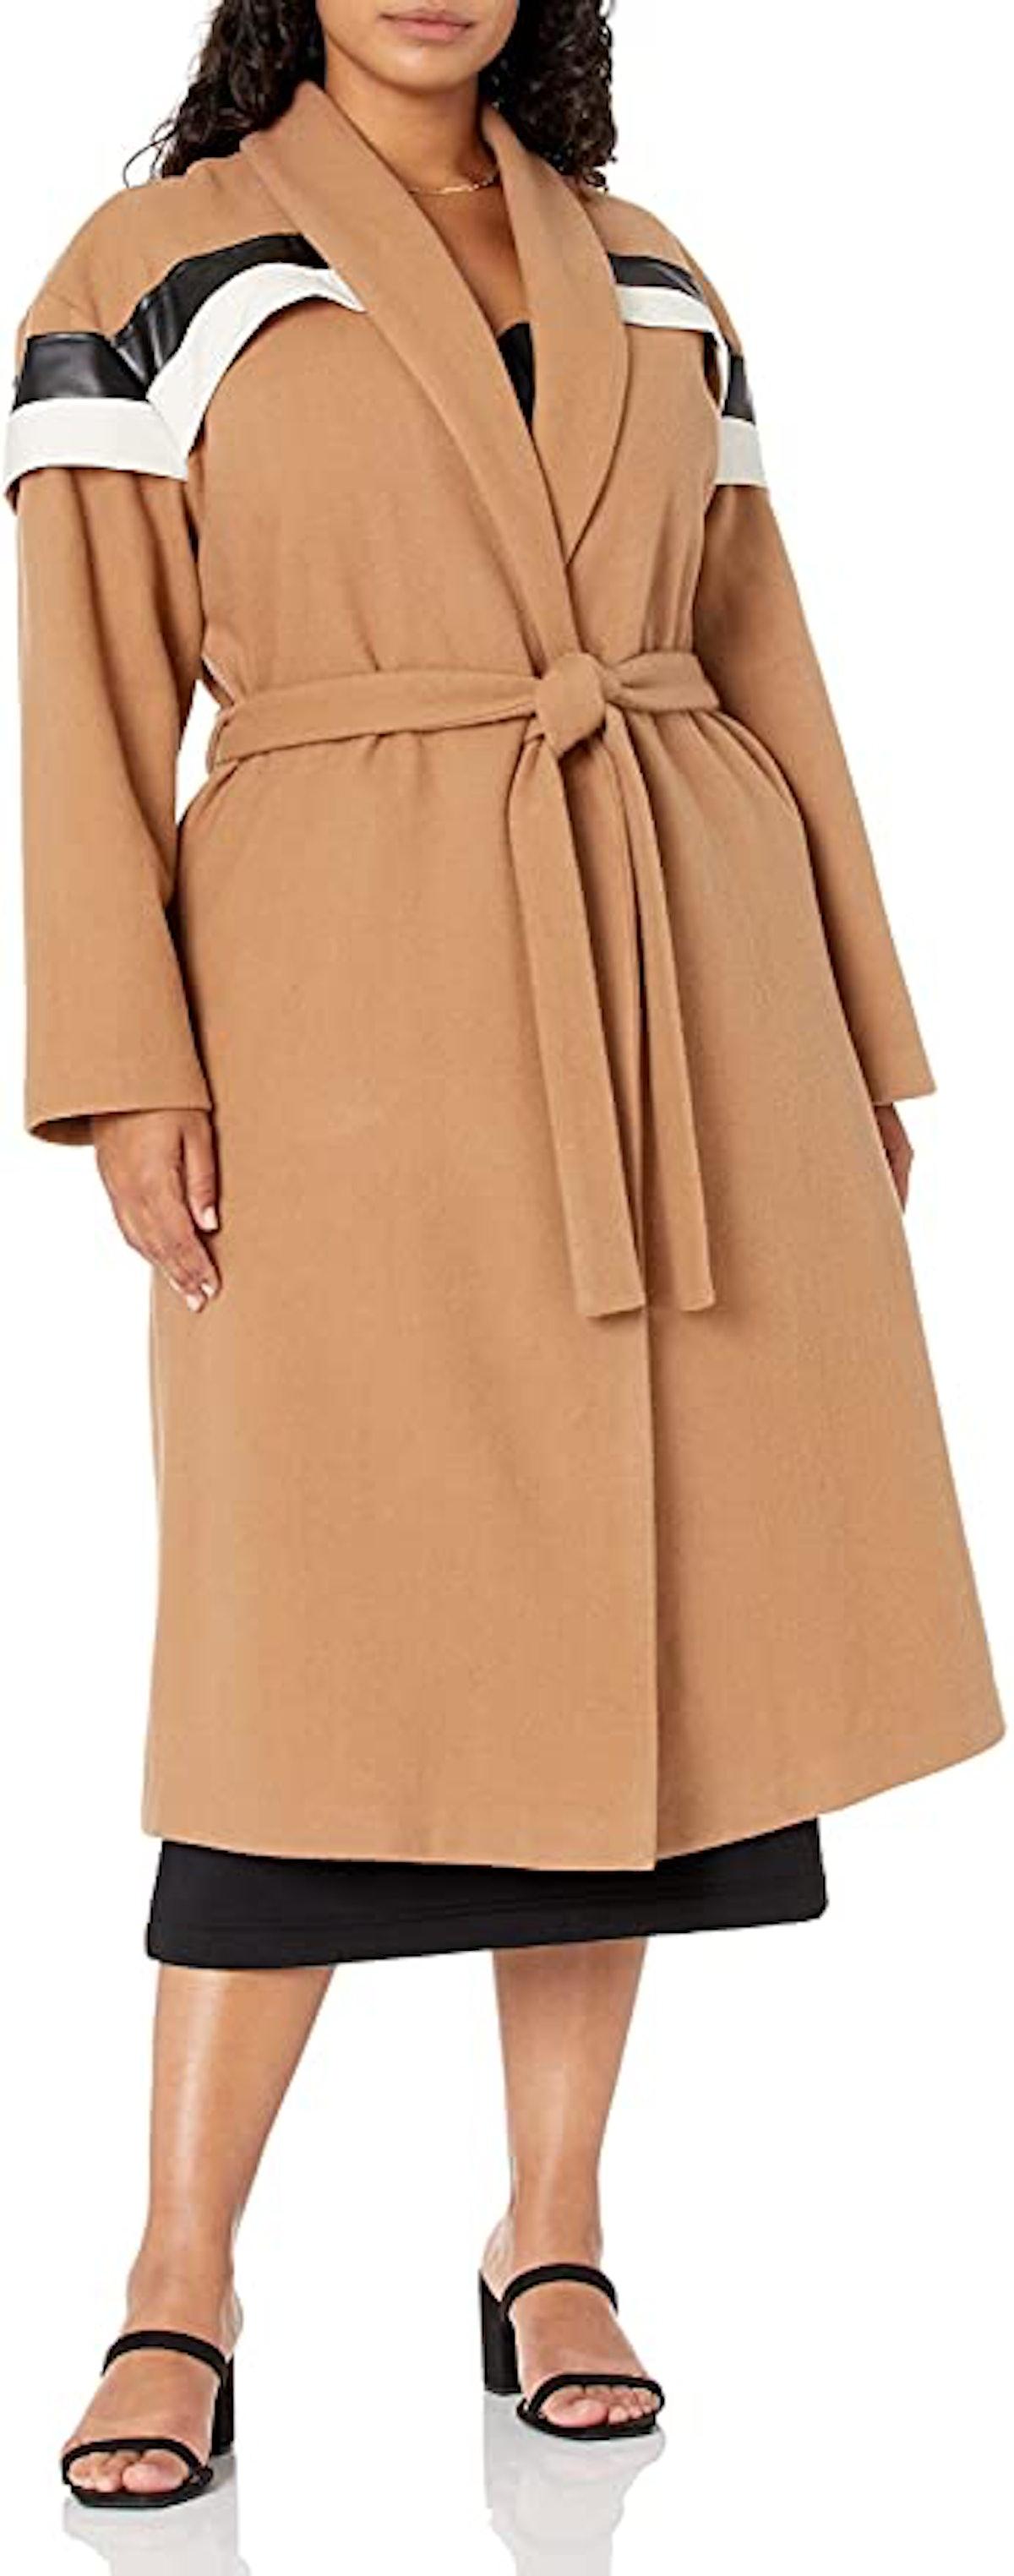 'Making the Cut' Season 2 Episode 6 Winning Look Andrea's Wool Camel Coat